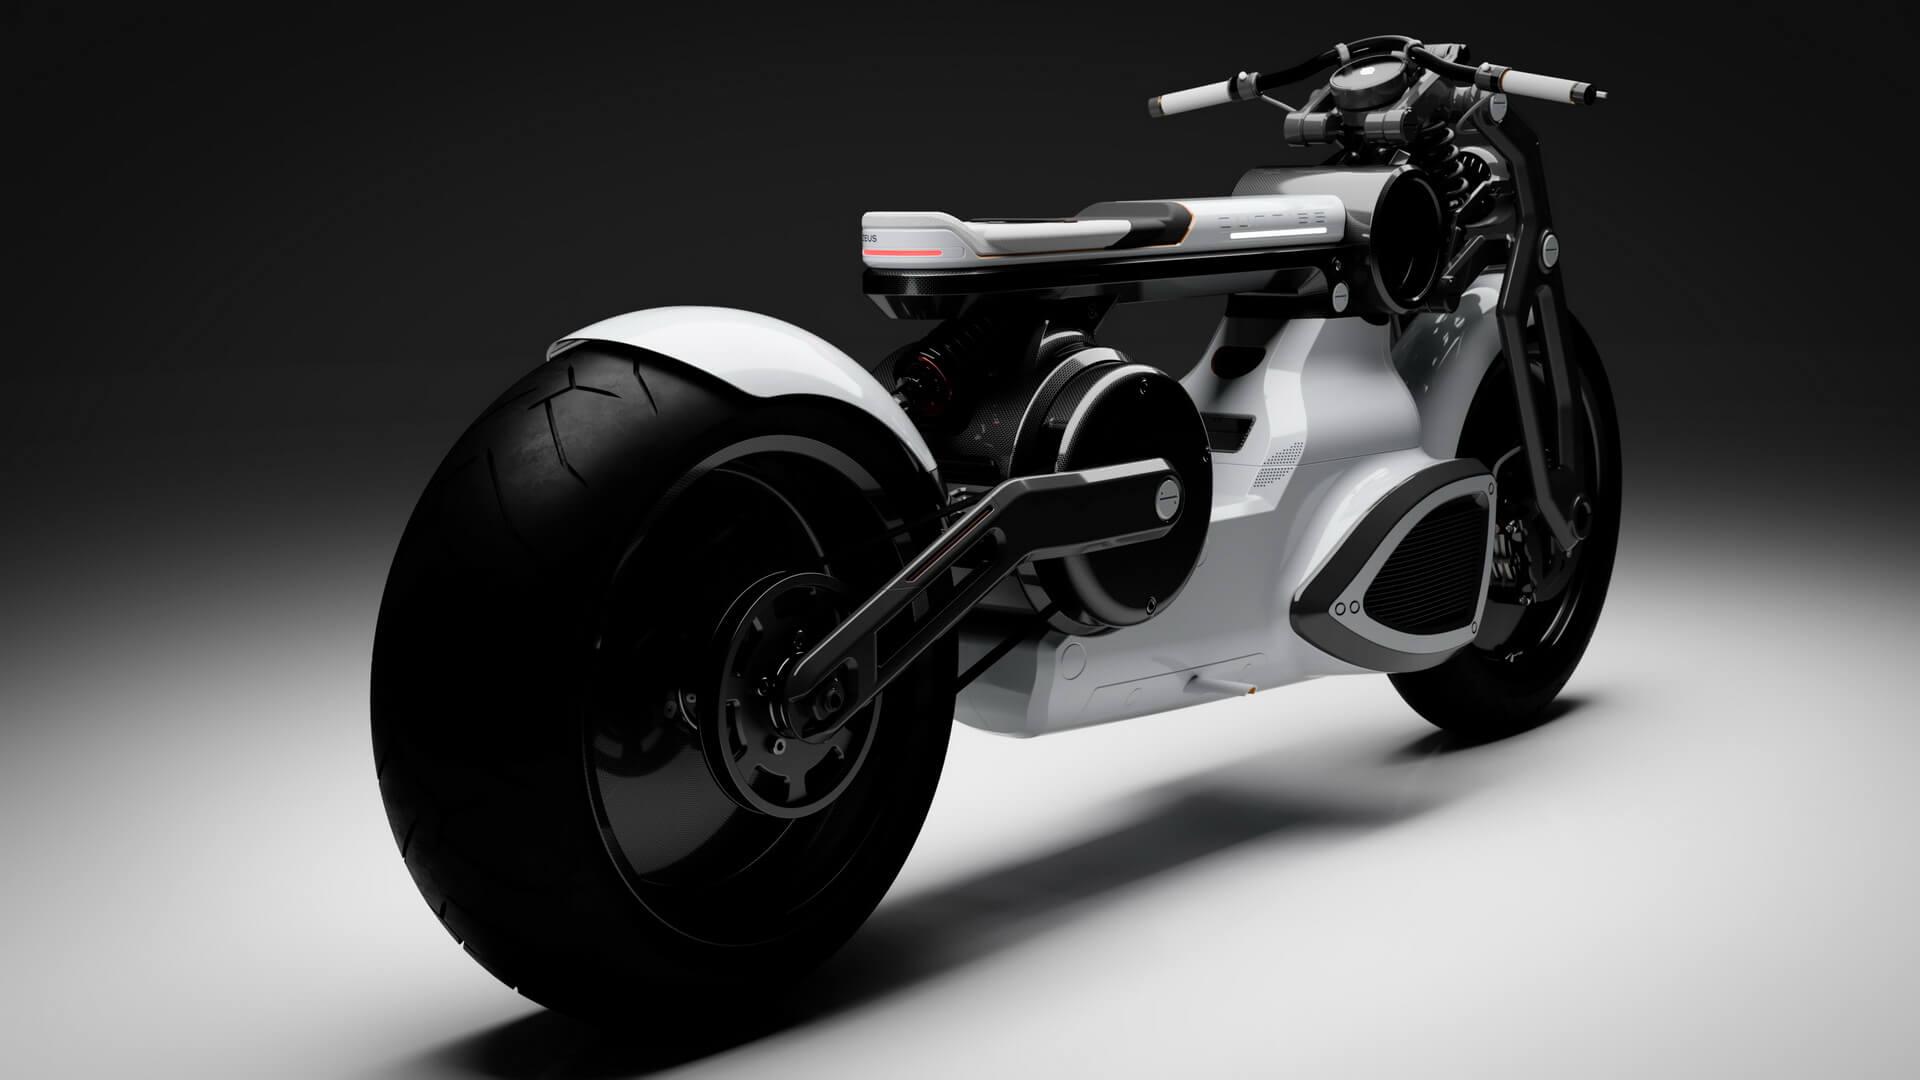 Электрический мотоцикл Zeus Cafe - фото 3